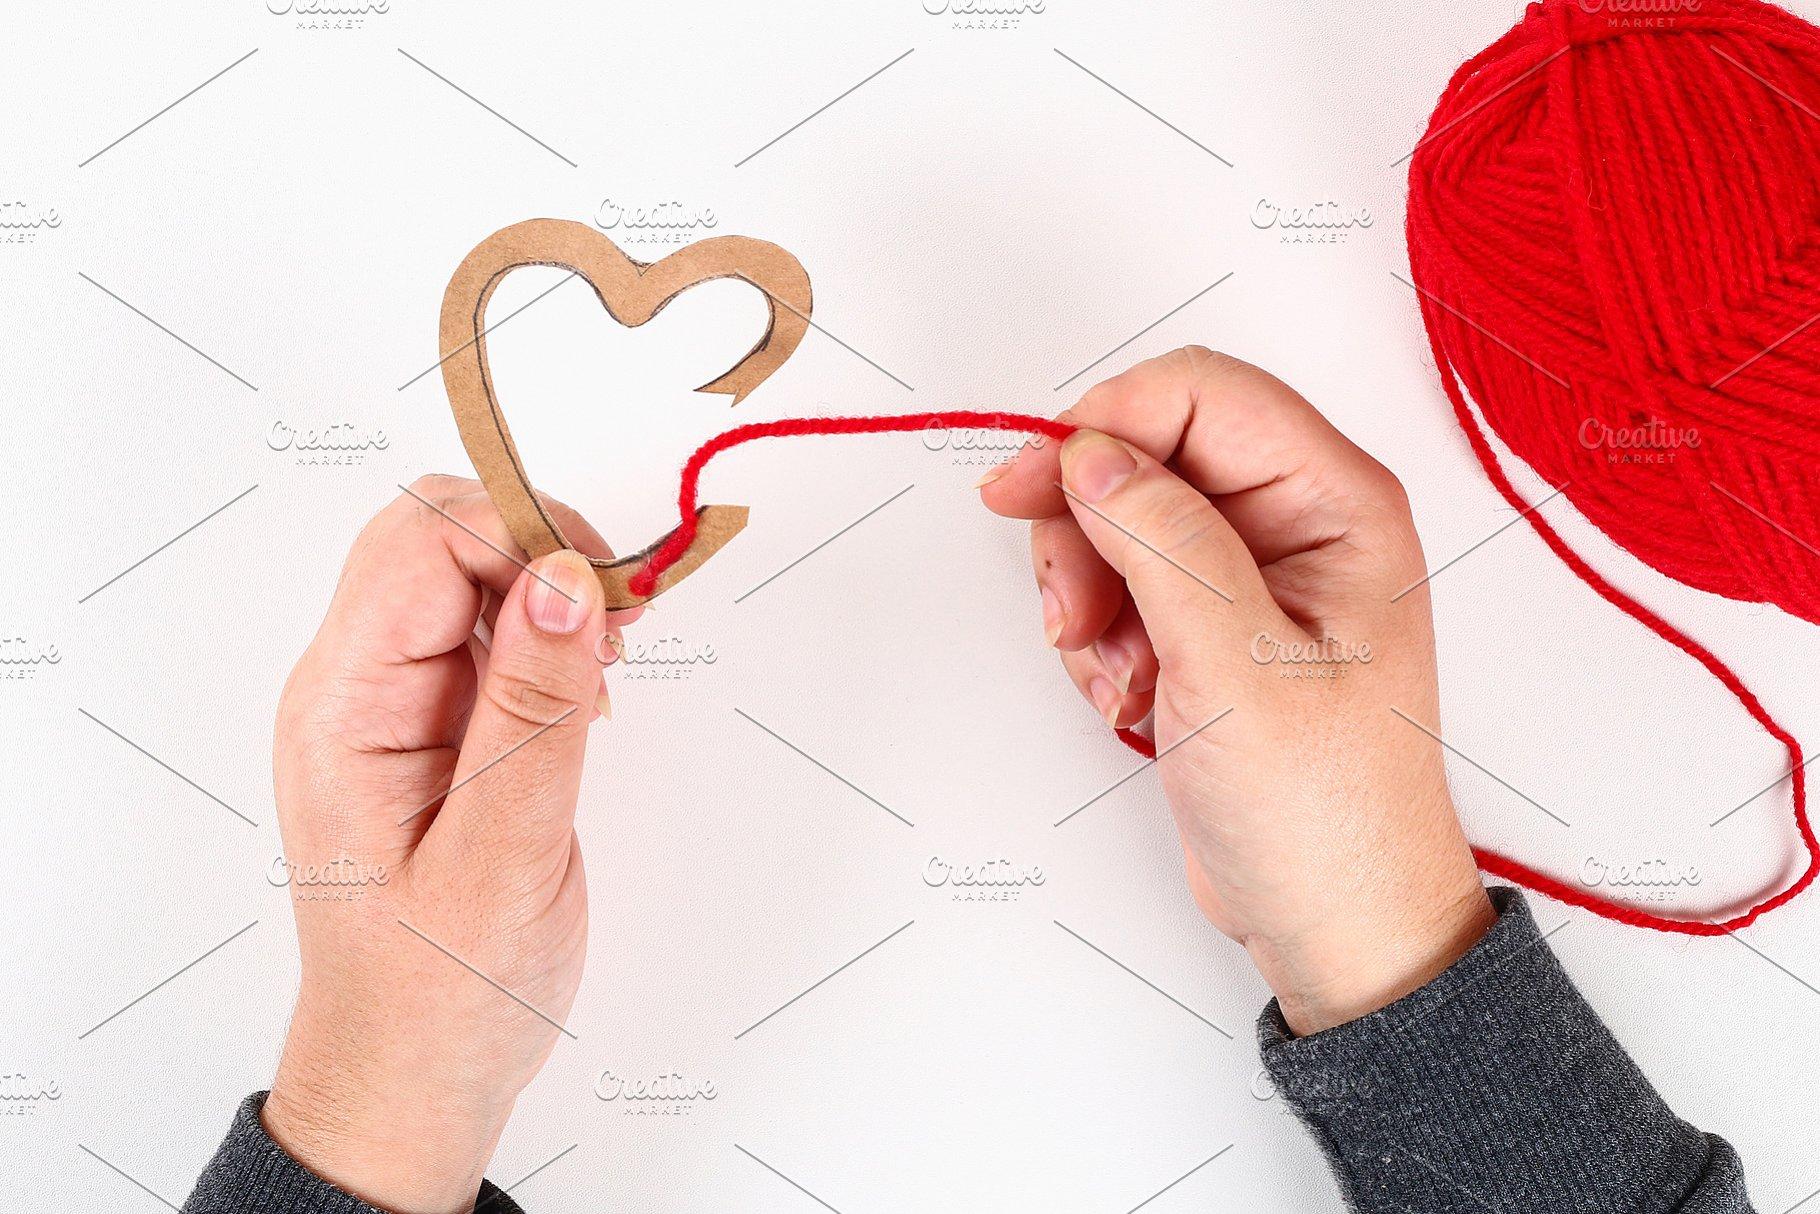 Red handmade diy hearts made of card